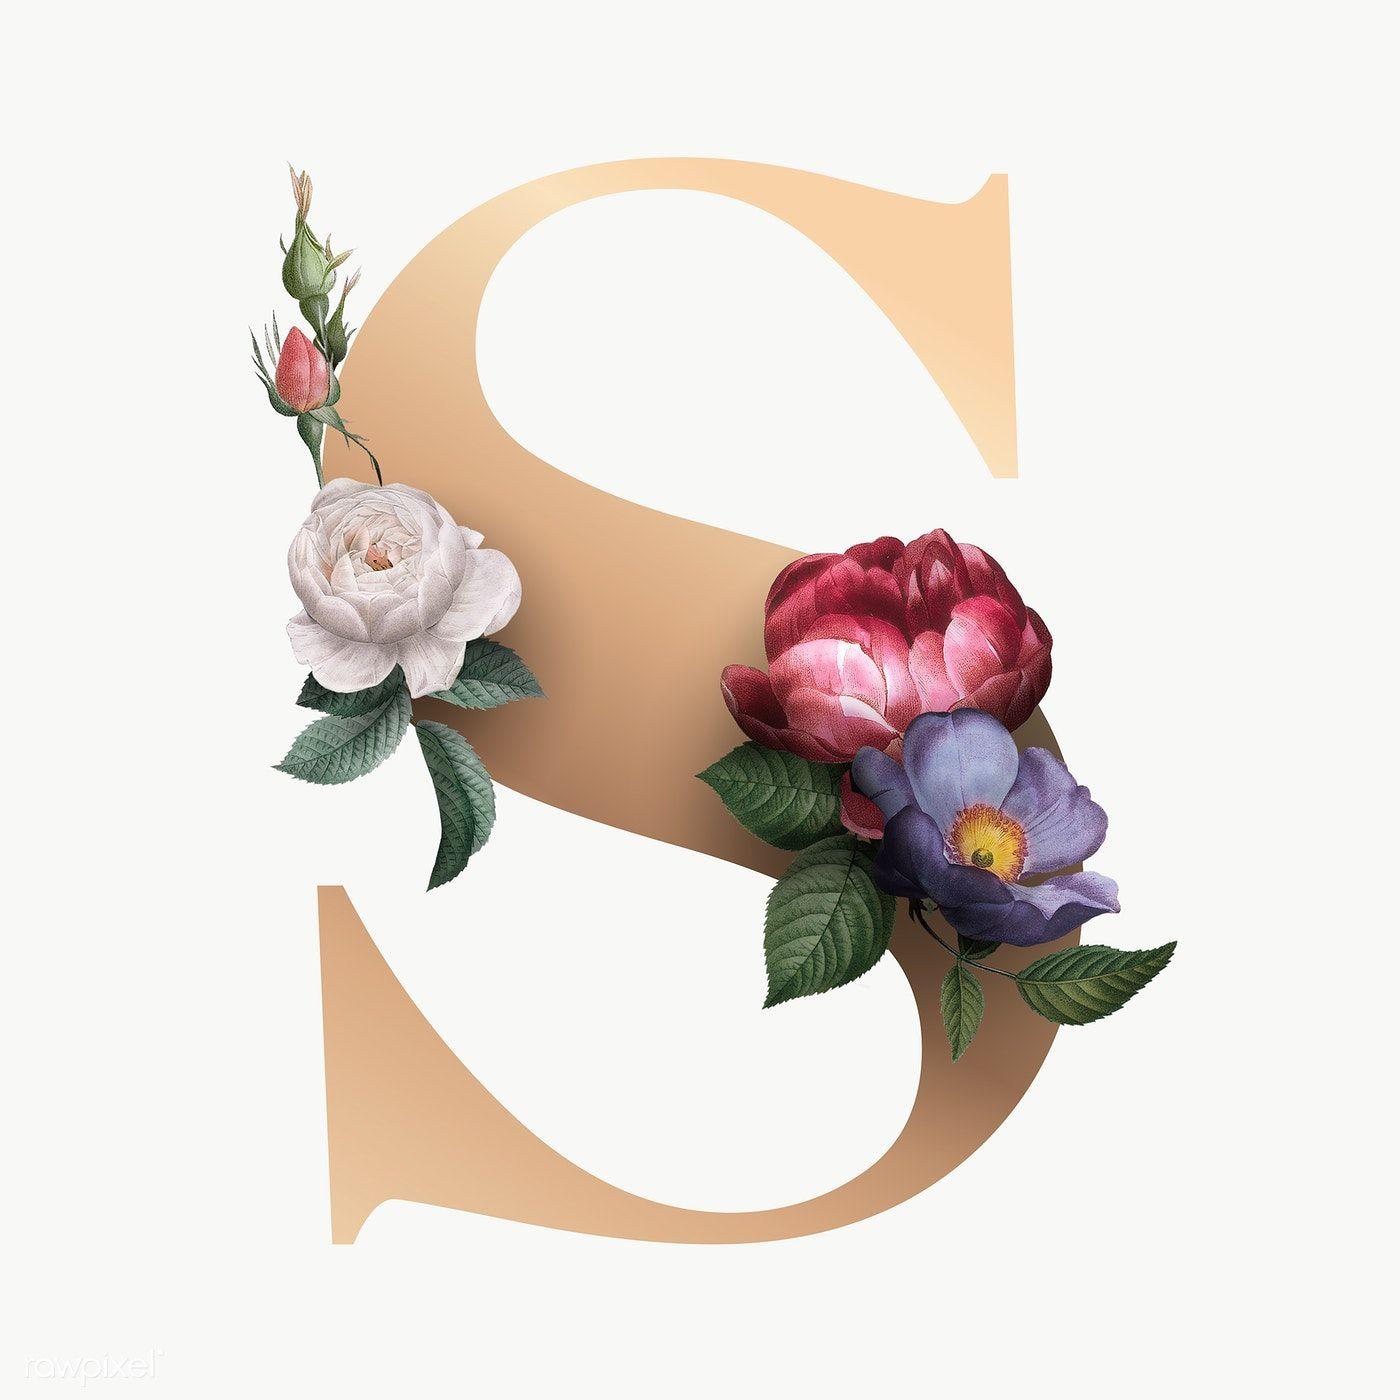 Classic And Elegant Floral Alphabet Font Letter S Transparent Png Free Image By Rawpixel Com Manota In 2020 Fonts Alphabet Lettering Fonts Lettering Alphabet Fonts